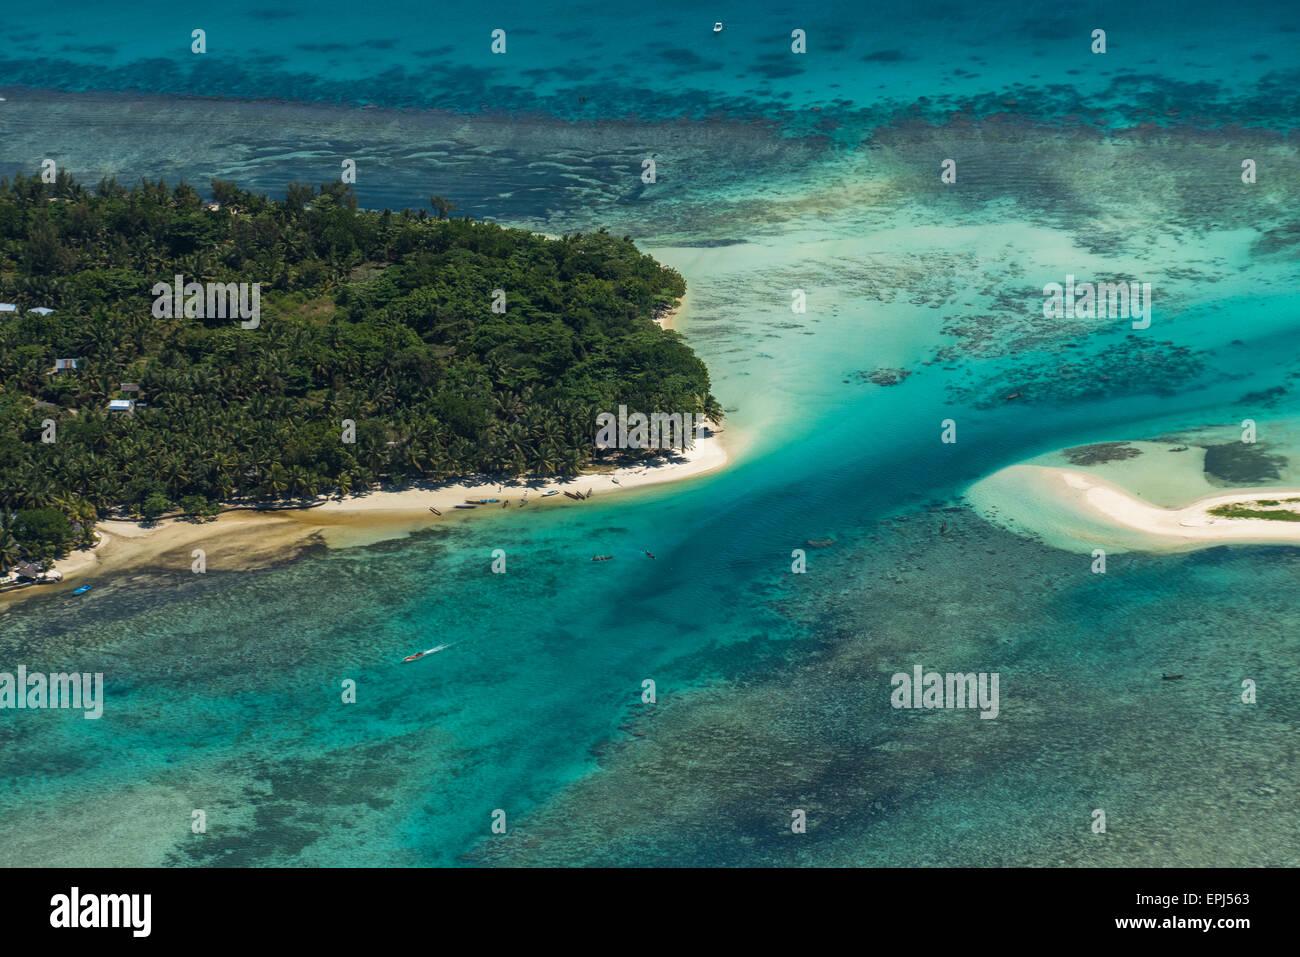 Aerial view of Sainte Marie island, Madagascar - Stock Image